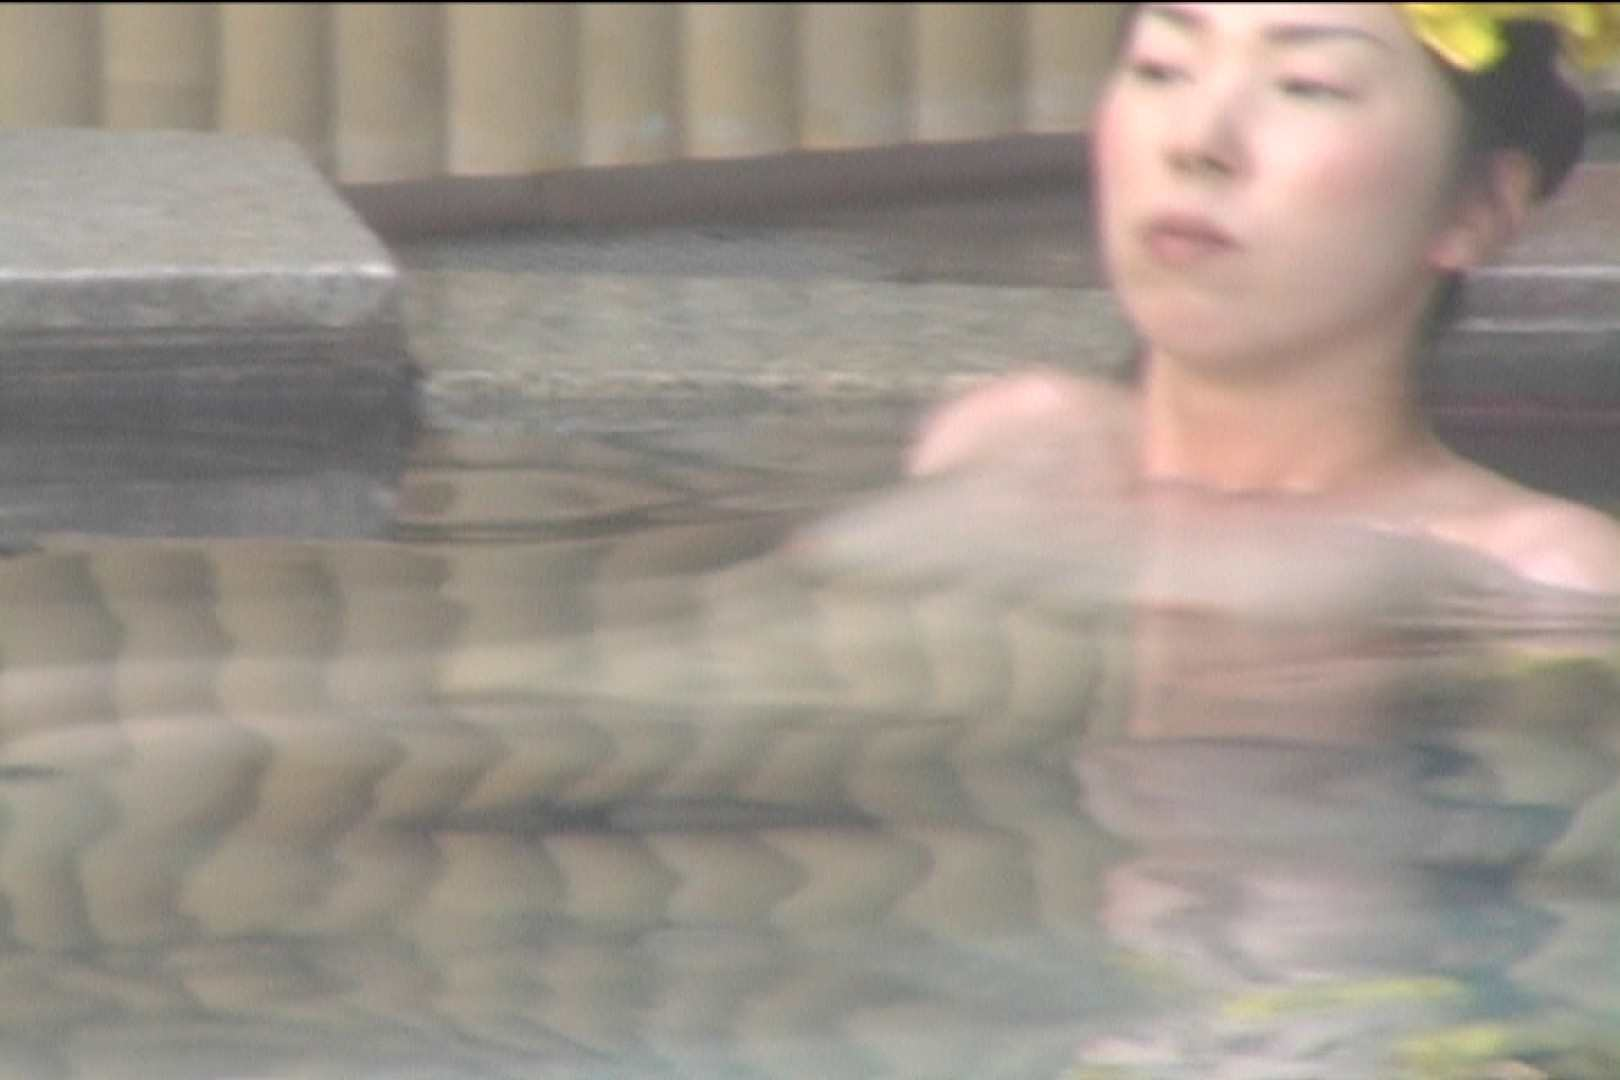 Aquaな露天風呂Vol.529 盗撮シリーズ | 露天風呂編  106PIX 23